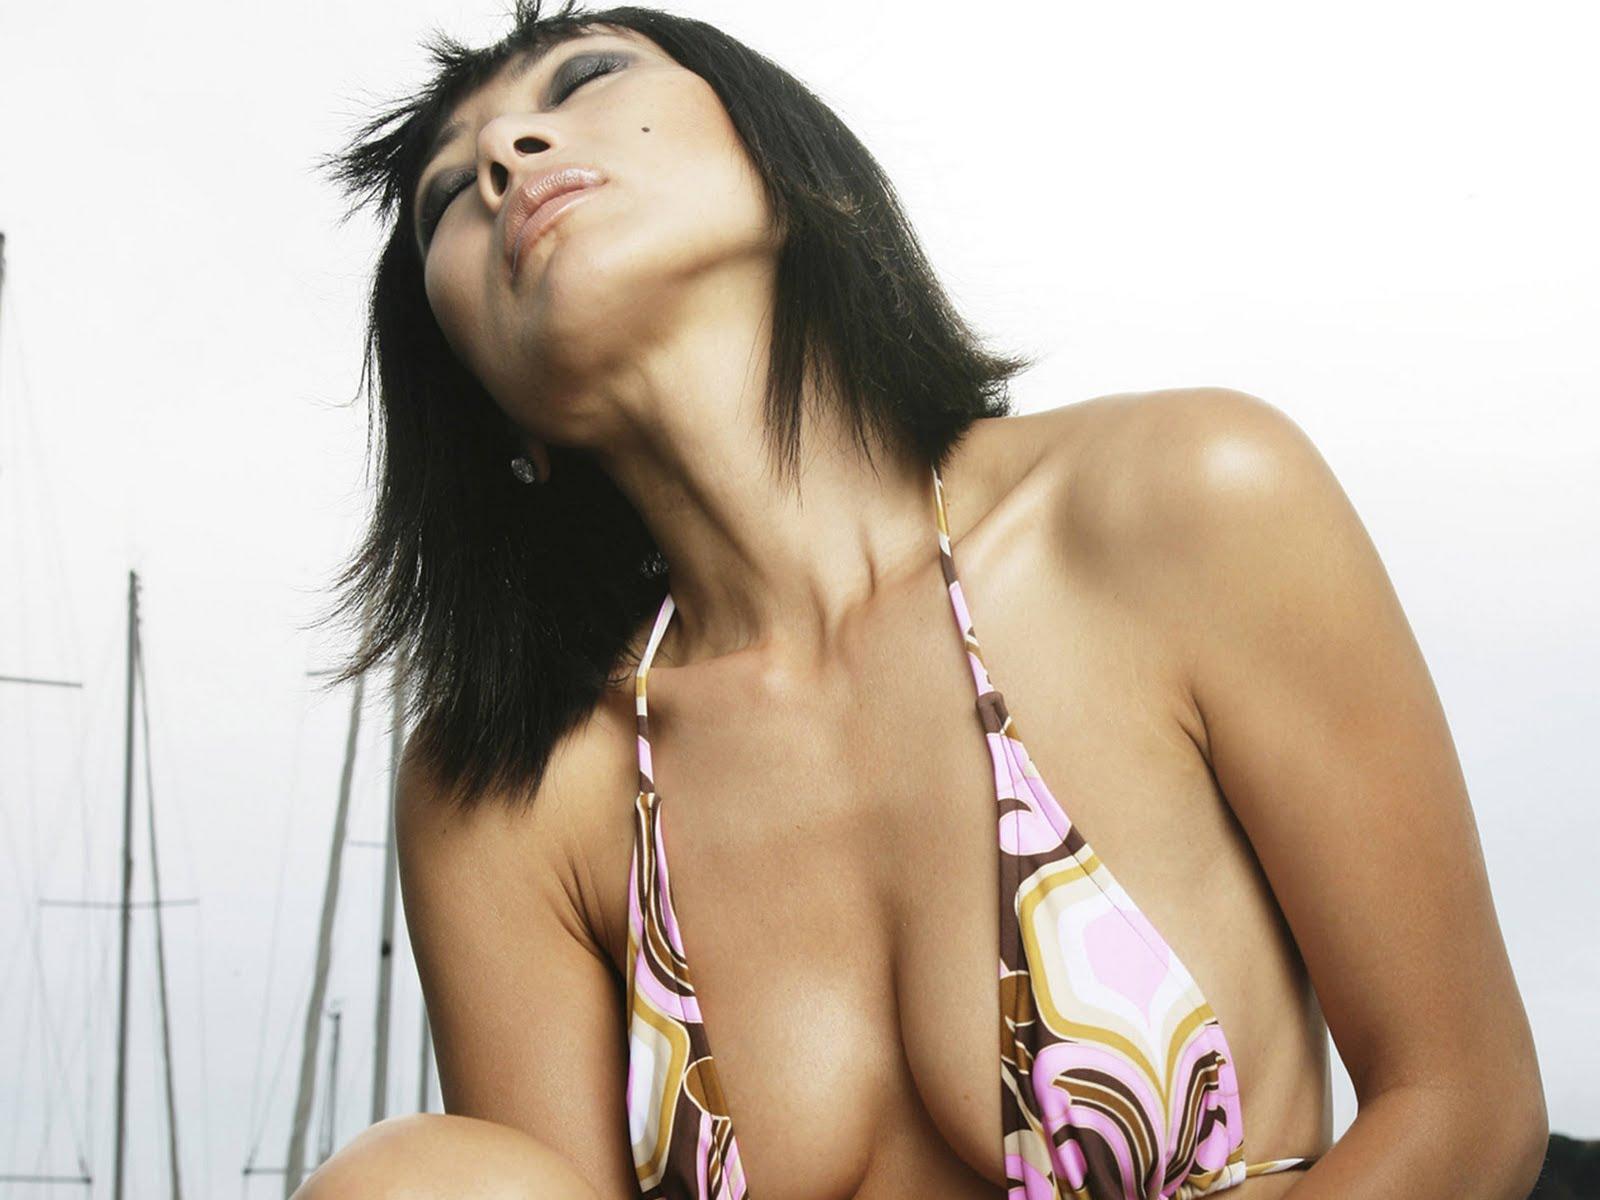 Nude skin female warriors movies nude film